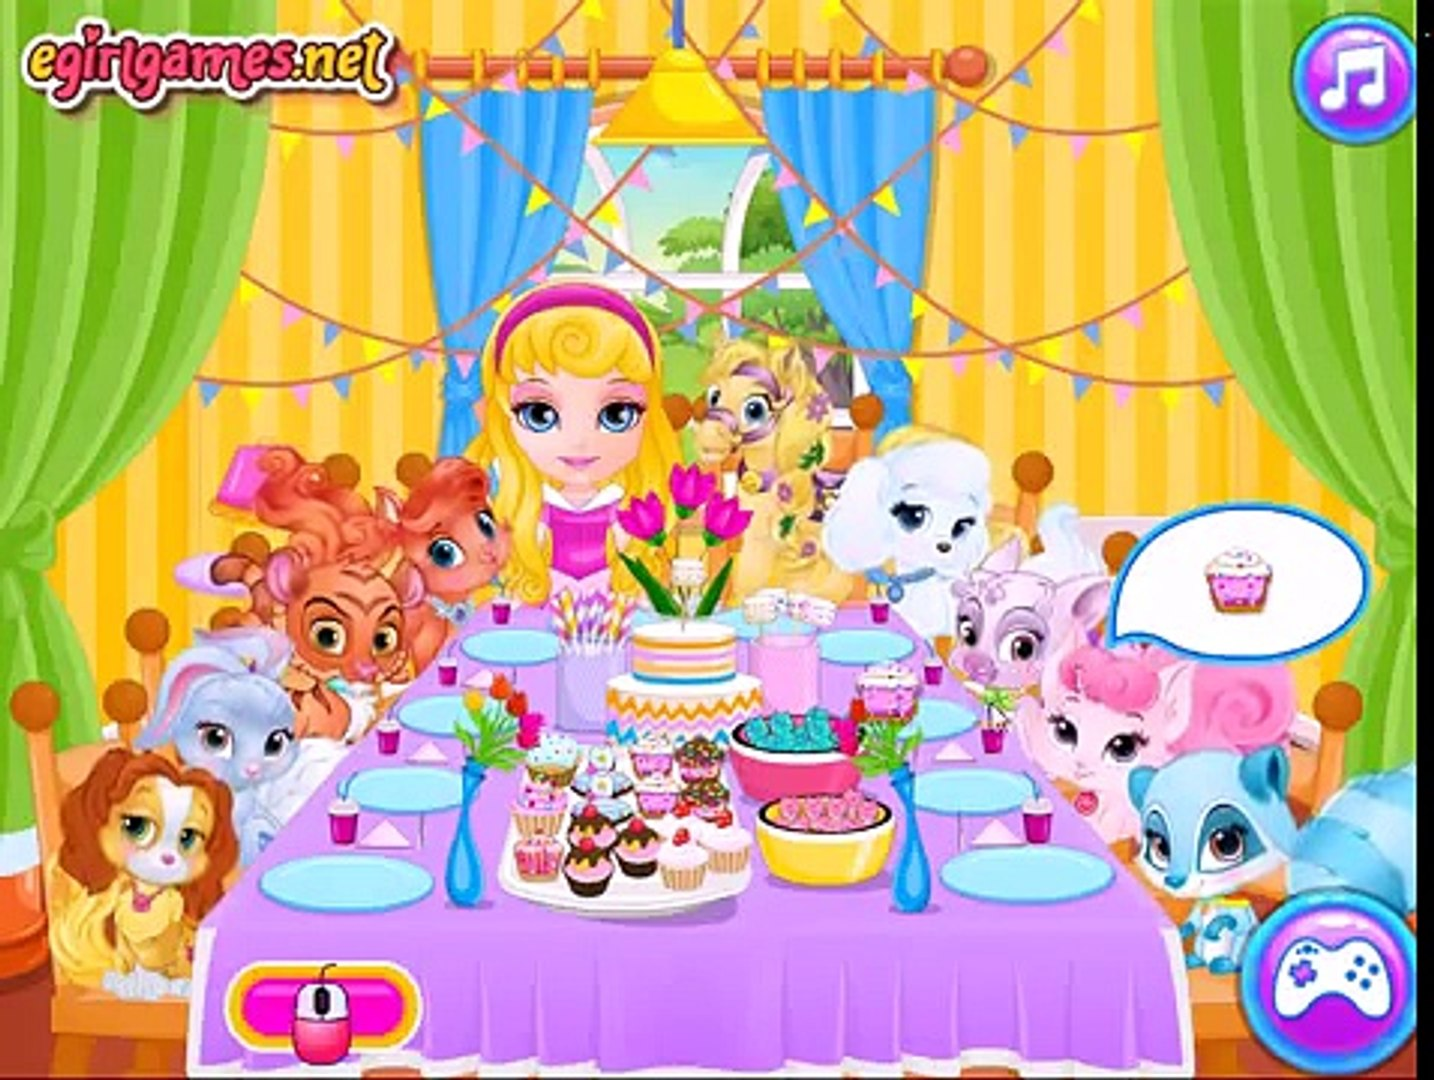 Baby Barbie Palace Pets Pj Party - Baby Barbie Disney Princess Palace Pet Party Game For K